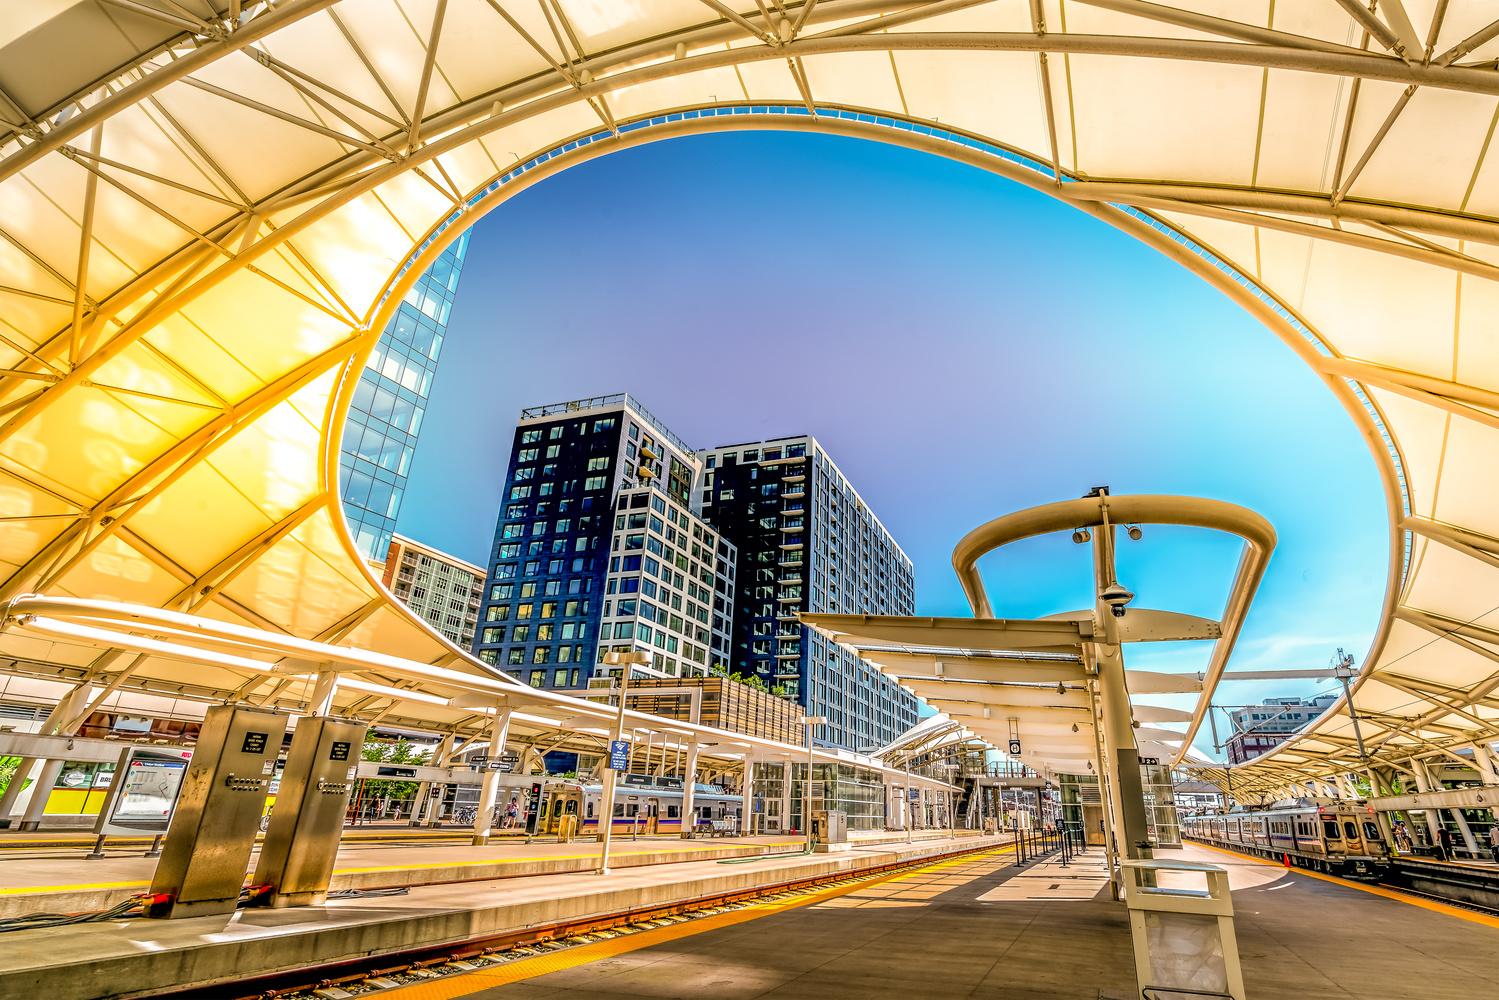 Union Station by Michael Rosen